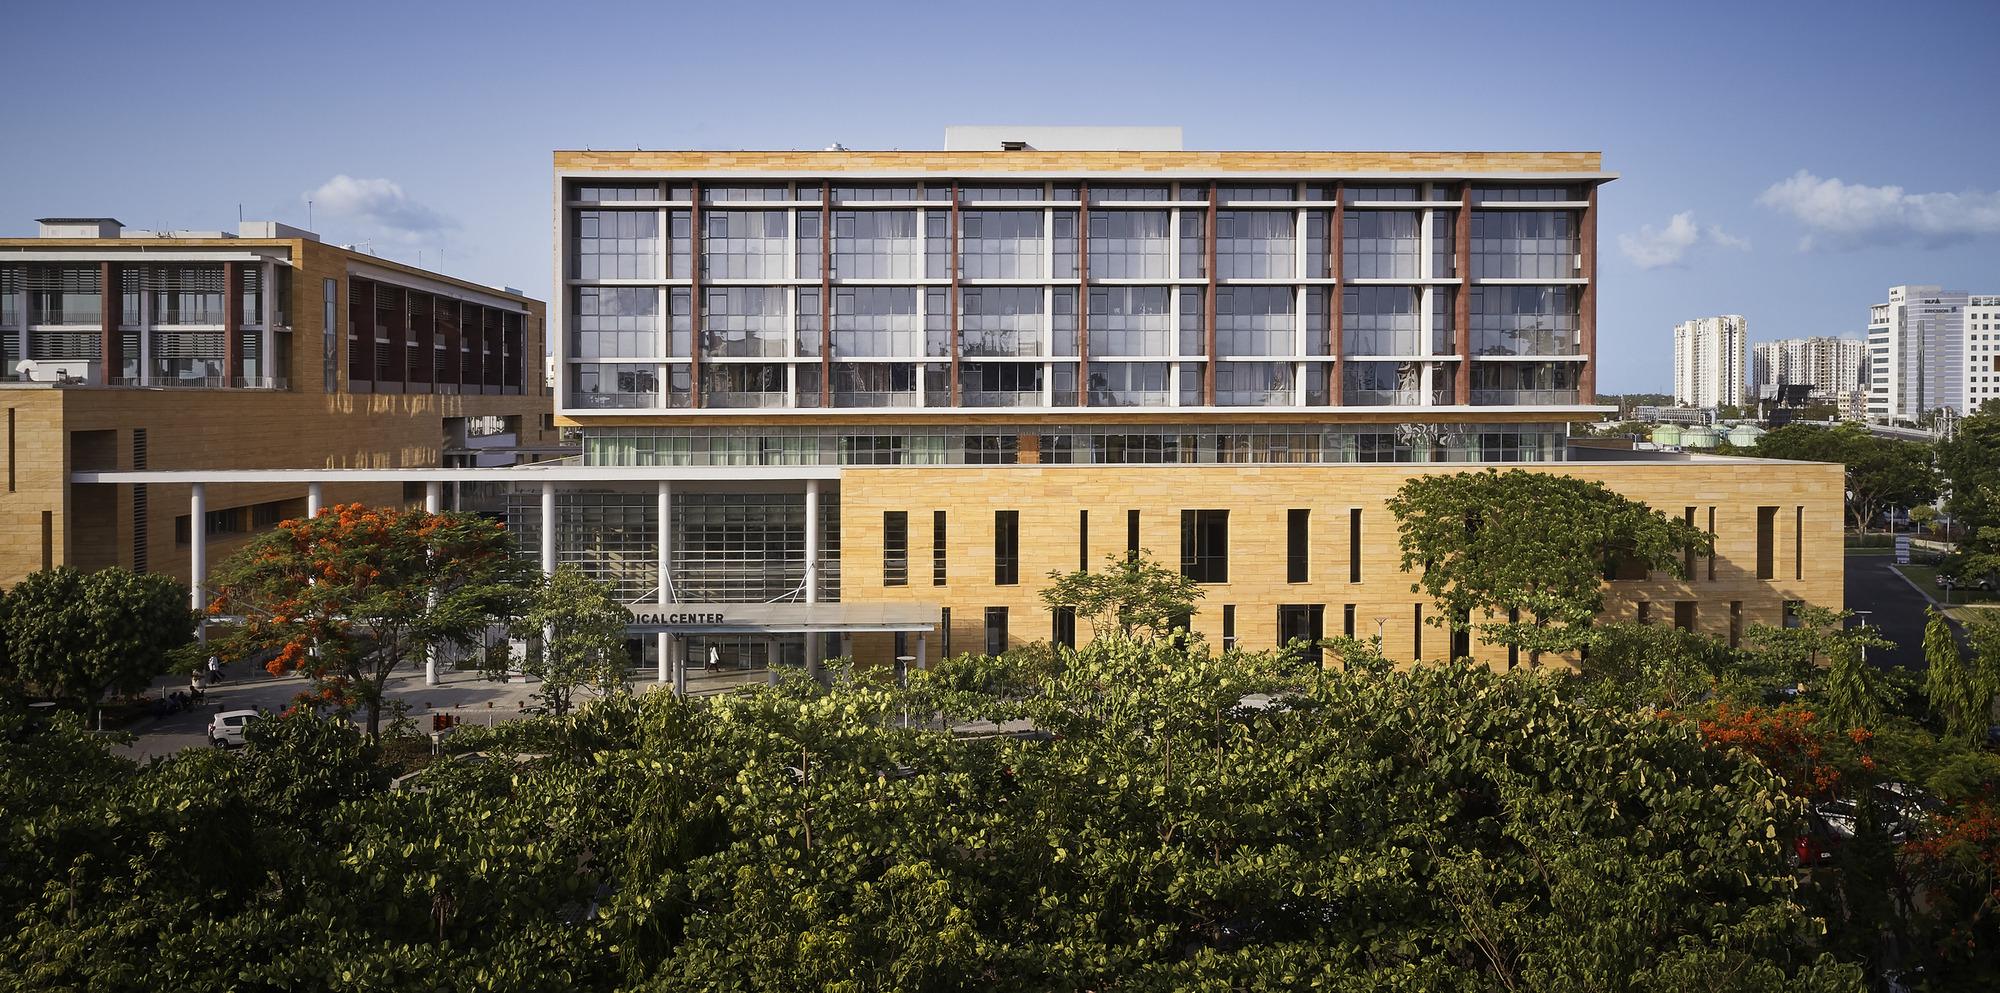 Tata Medical Center / CannonDesign